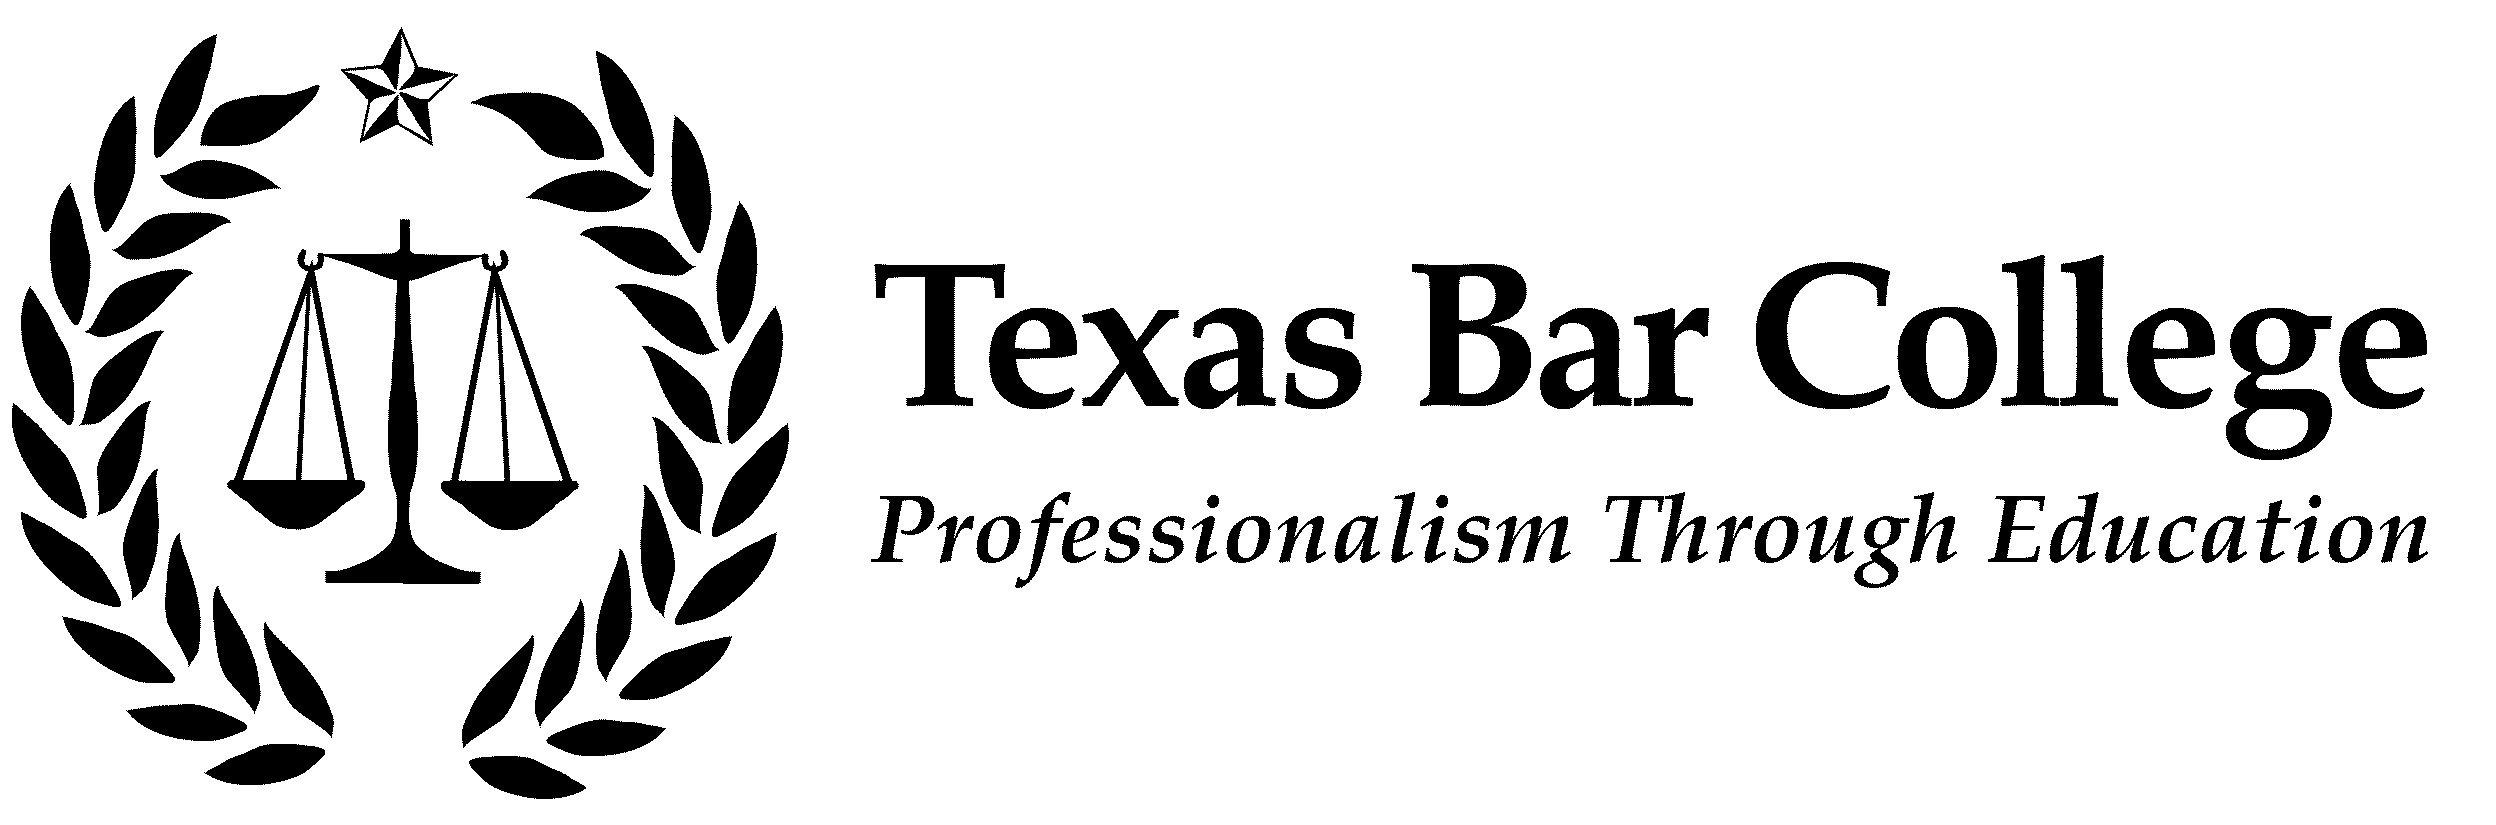 TX-Bar-College.jpg